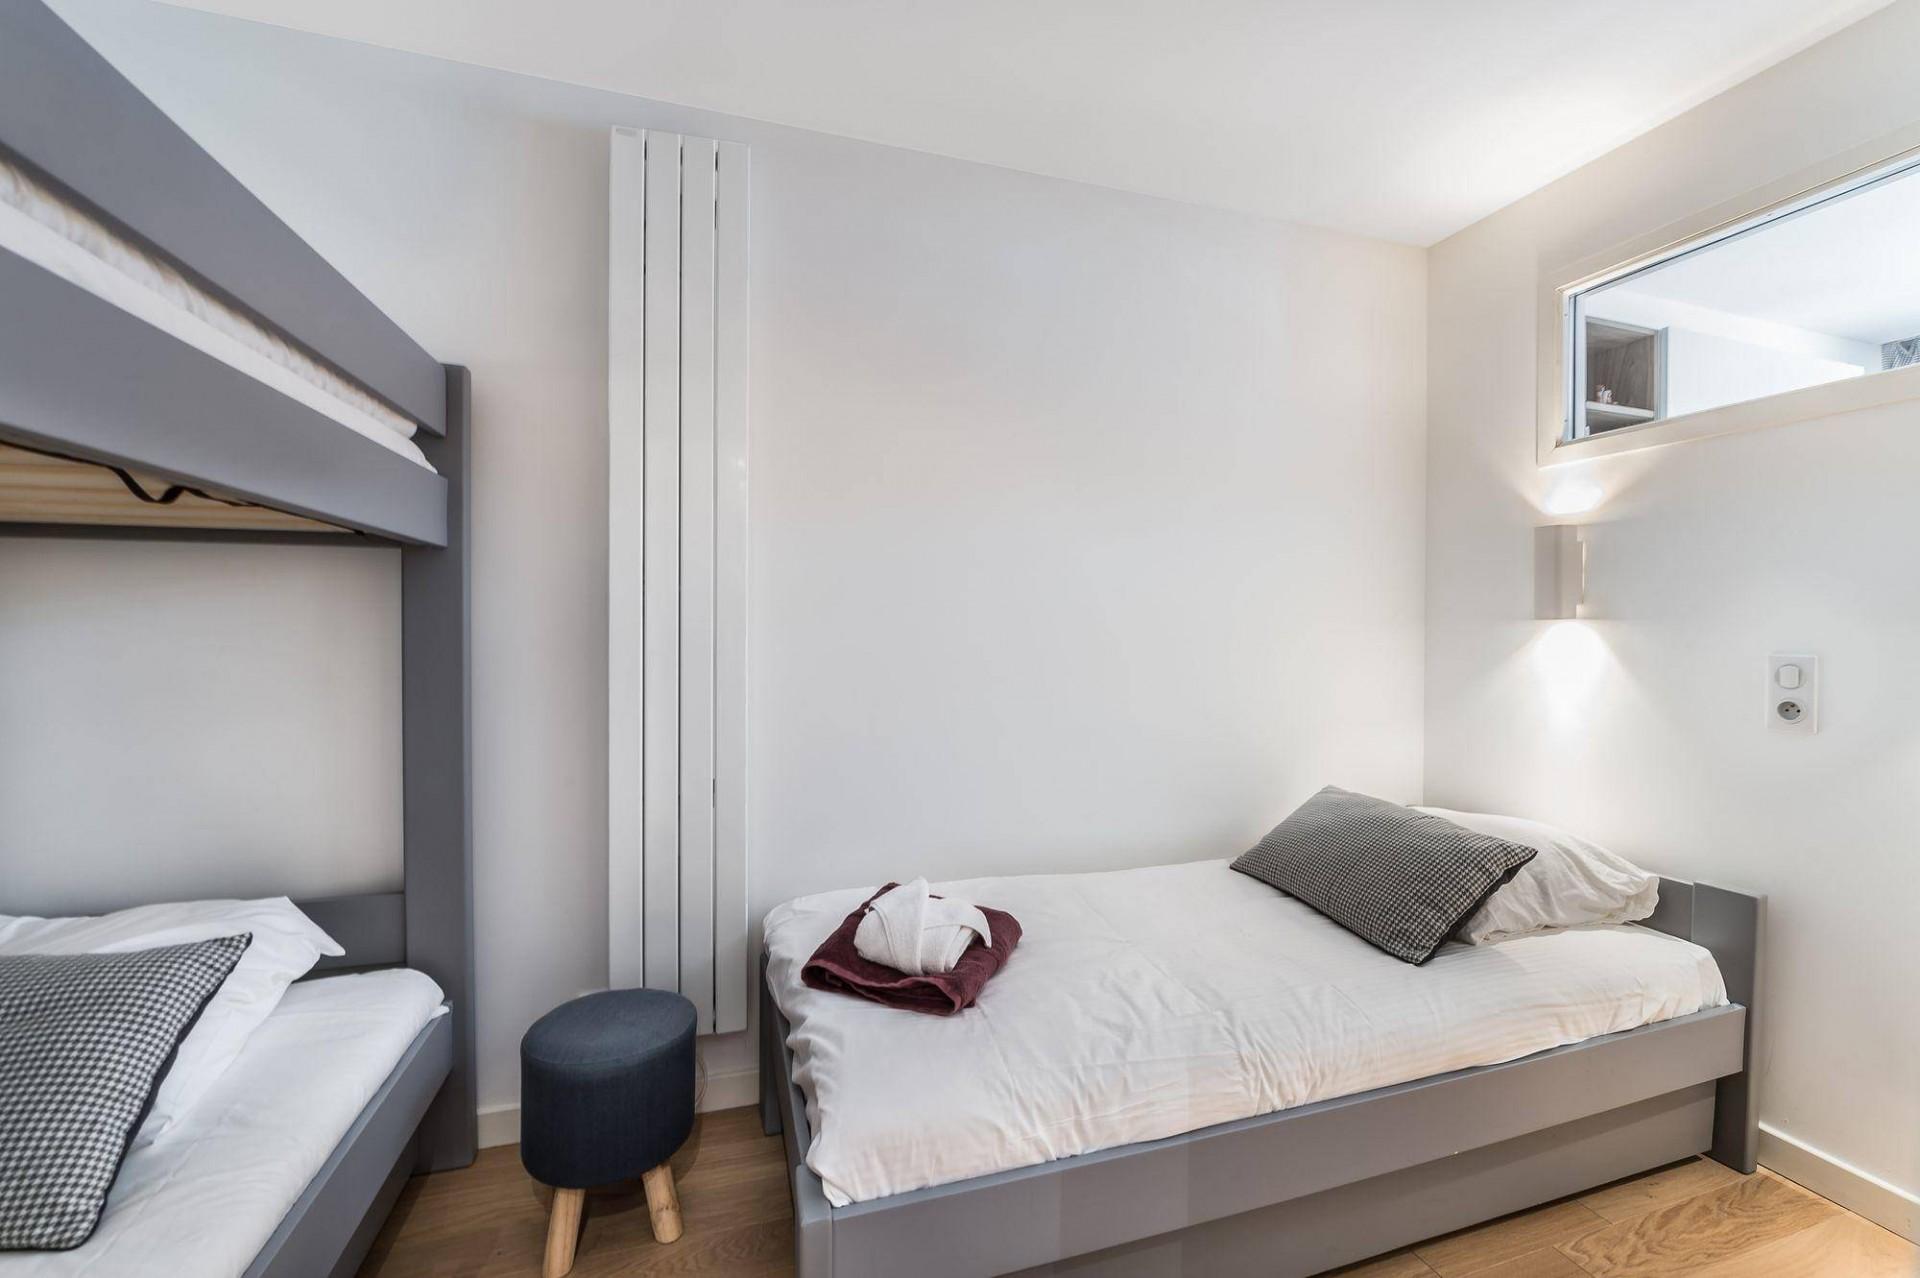 Val d'Isère Luxury Rental Appartment Eclaite Bedroom 3